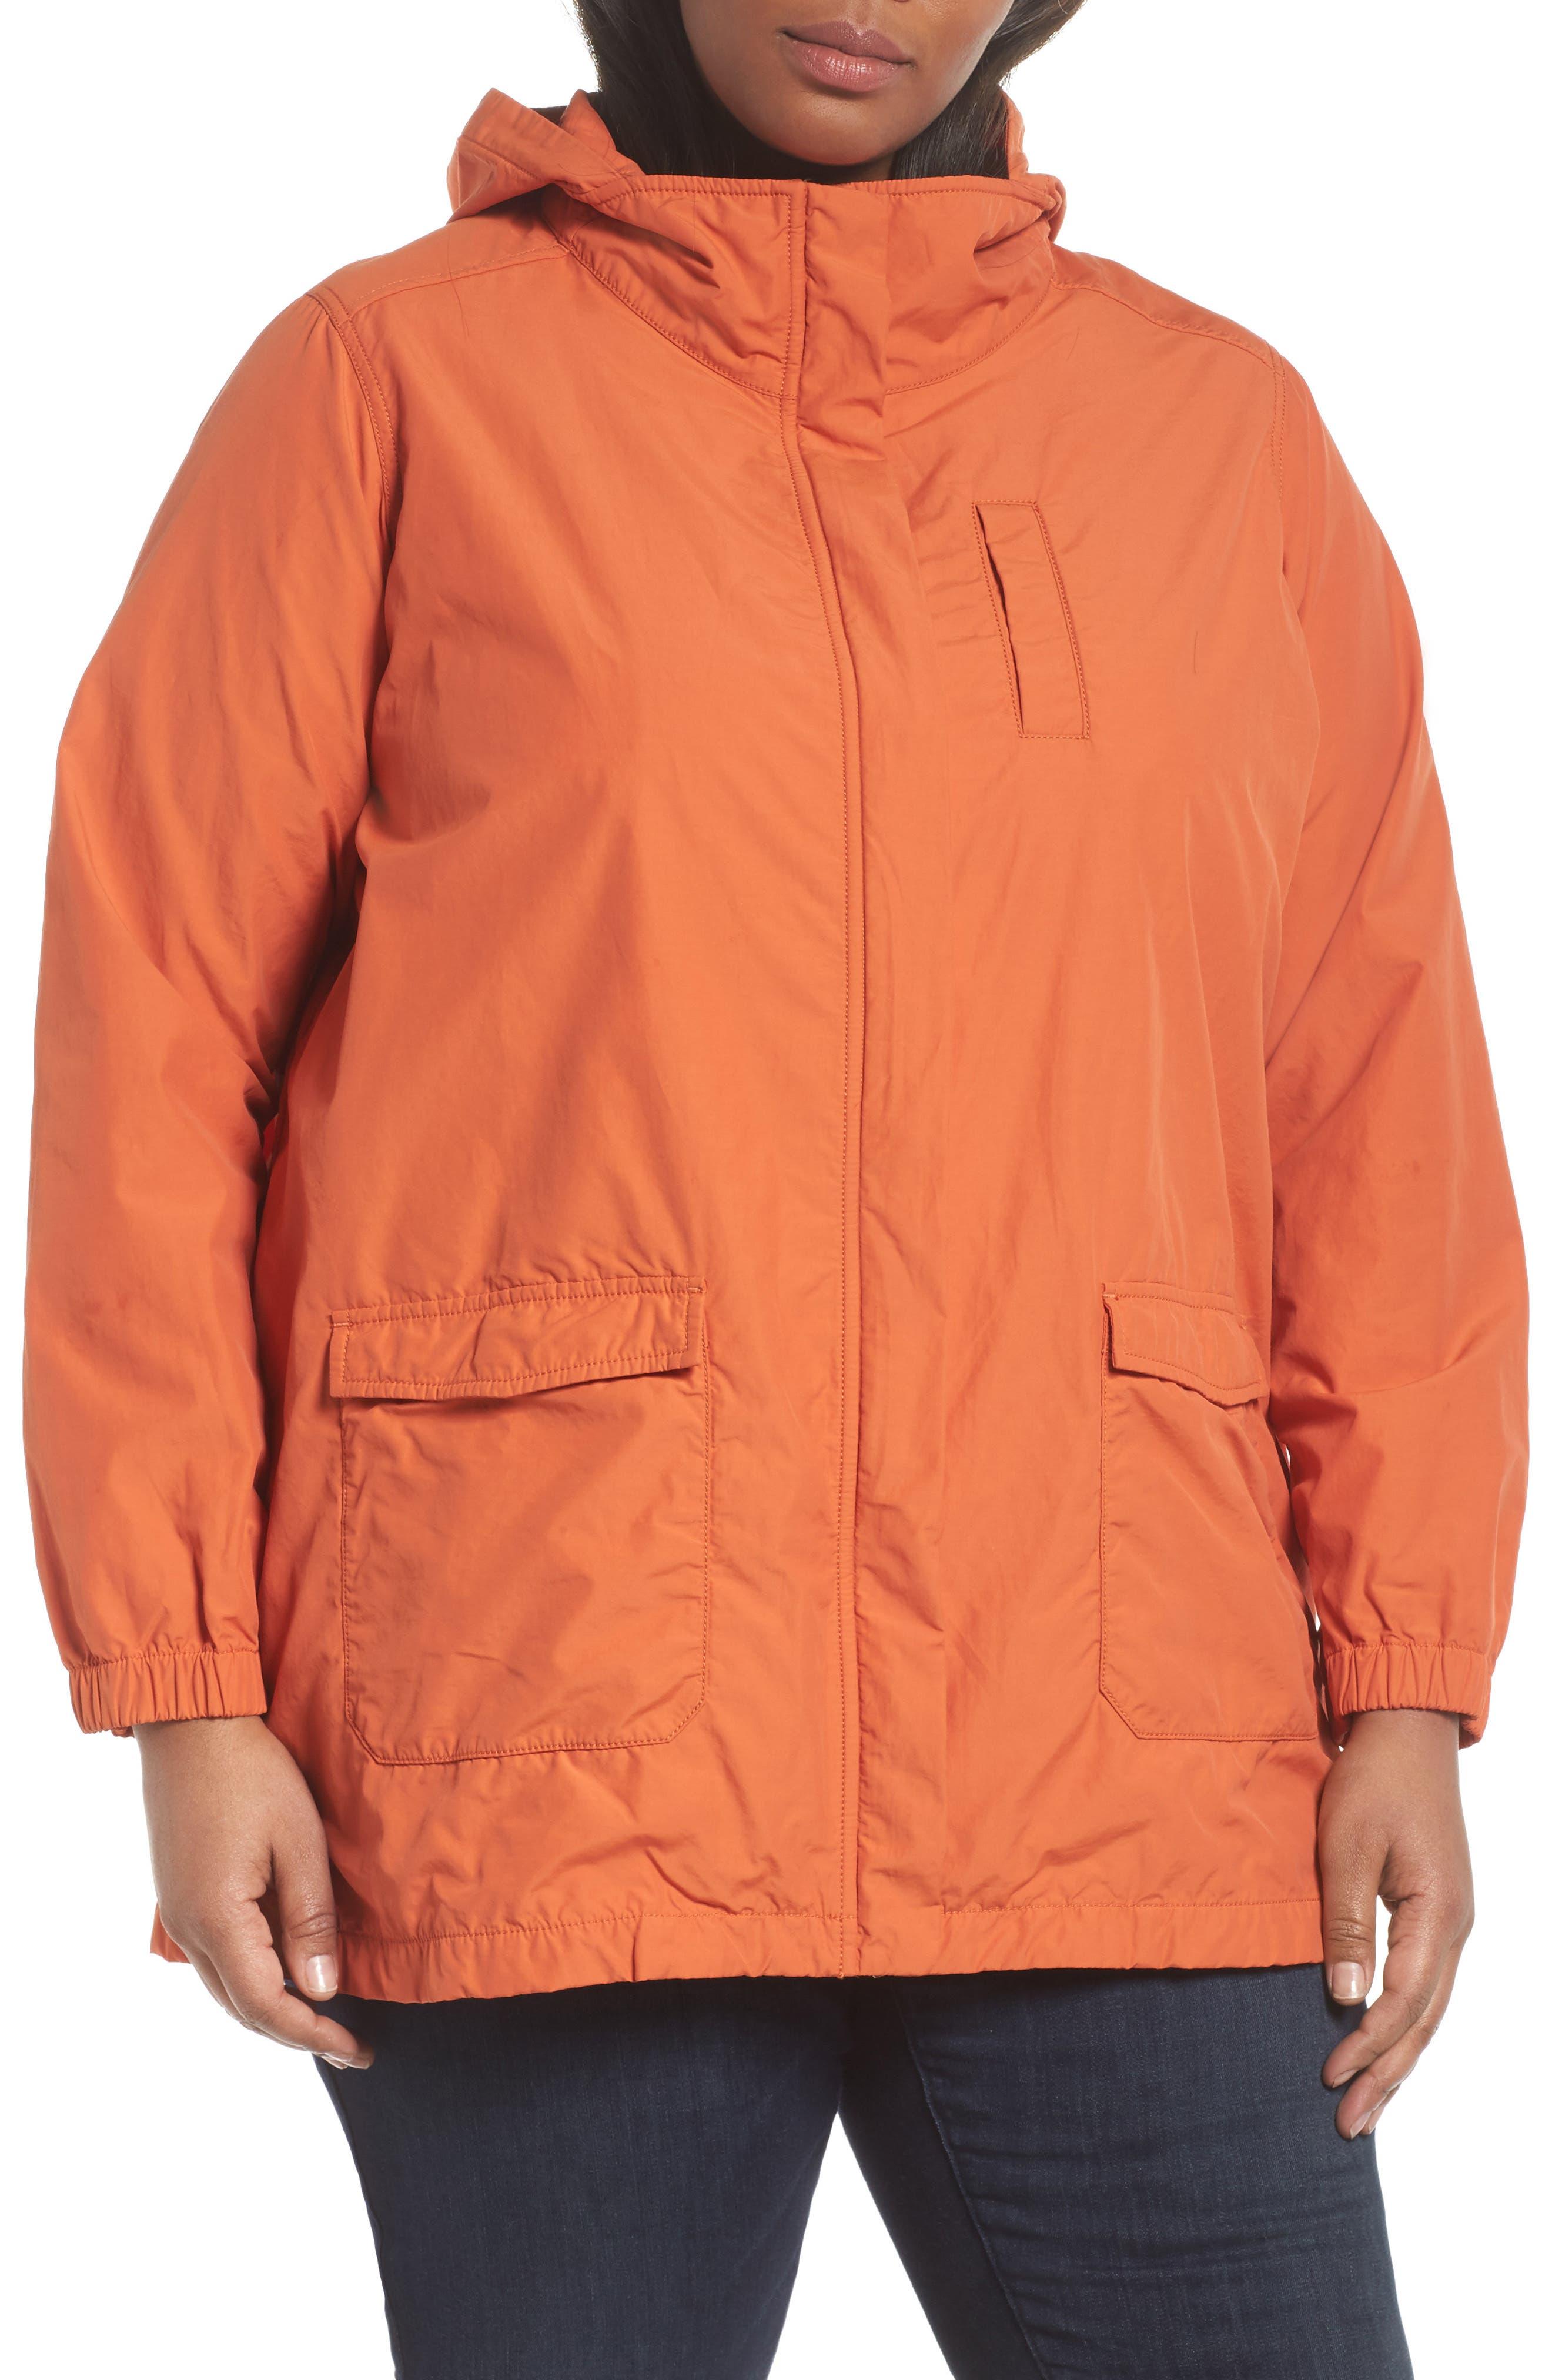 Hooded Organic Cotton Blend Jacket,                             Alternate thumbnail 4, color,                             Tiger